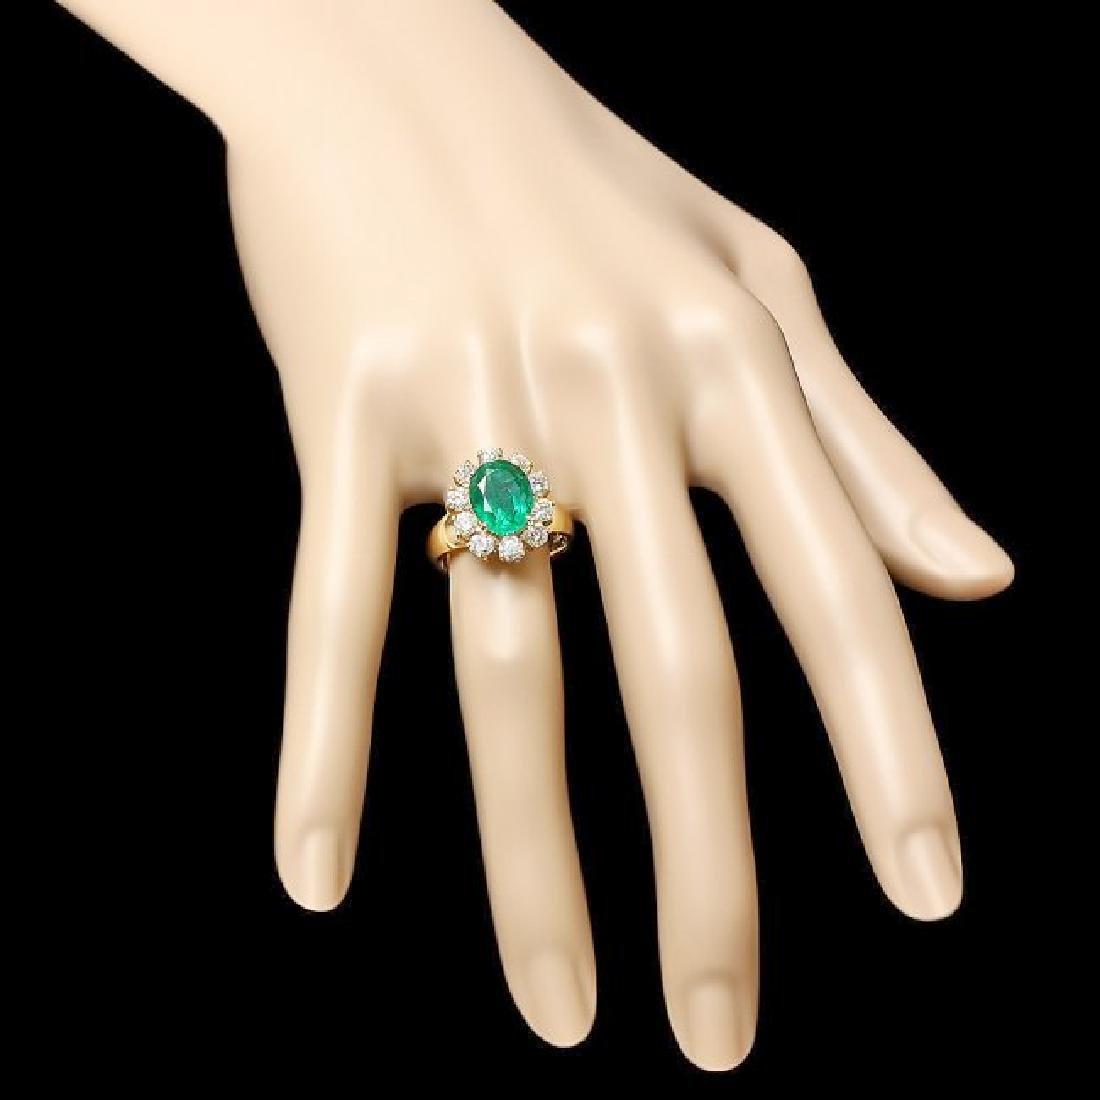 14k Gold 3.50ct Emerald 1.30ct Diamond Ring - 3